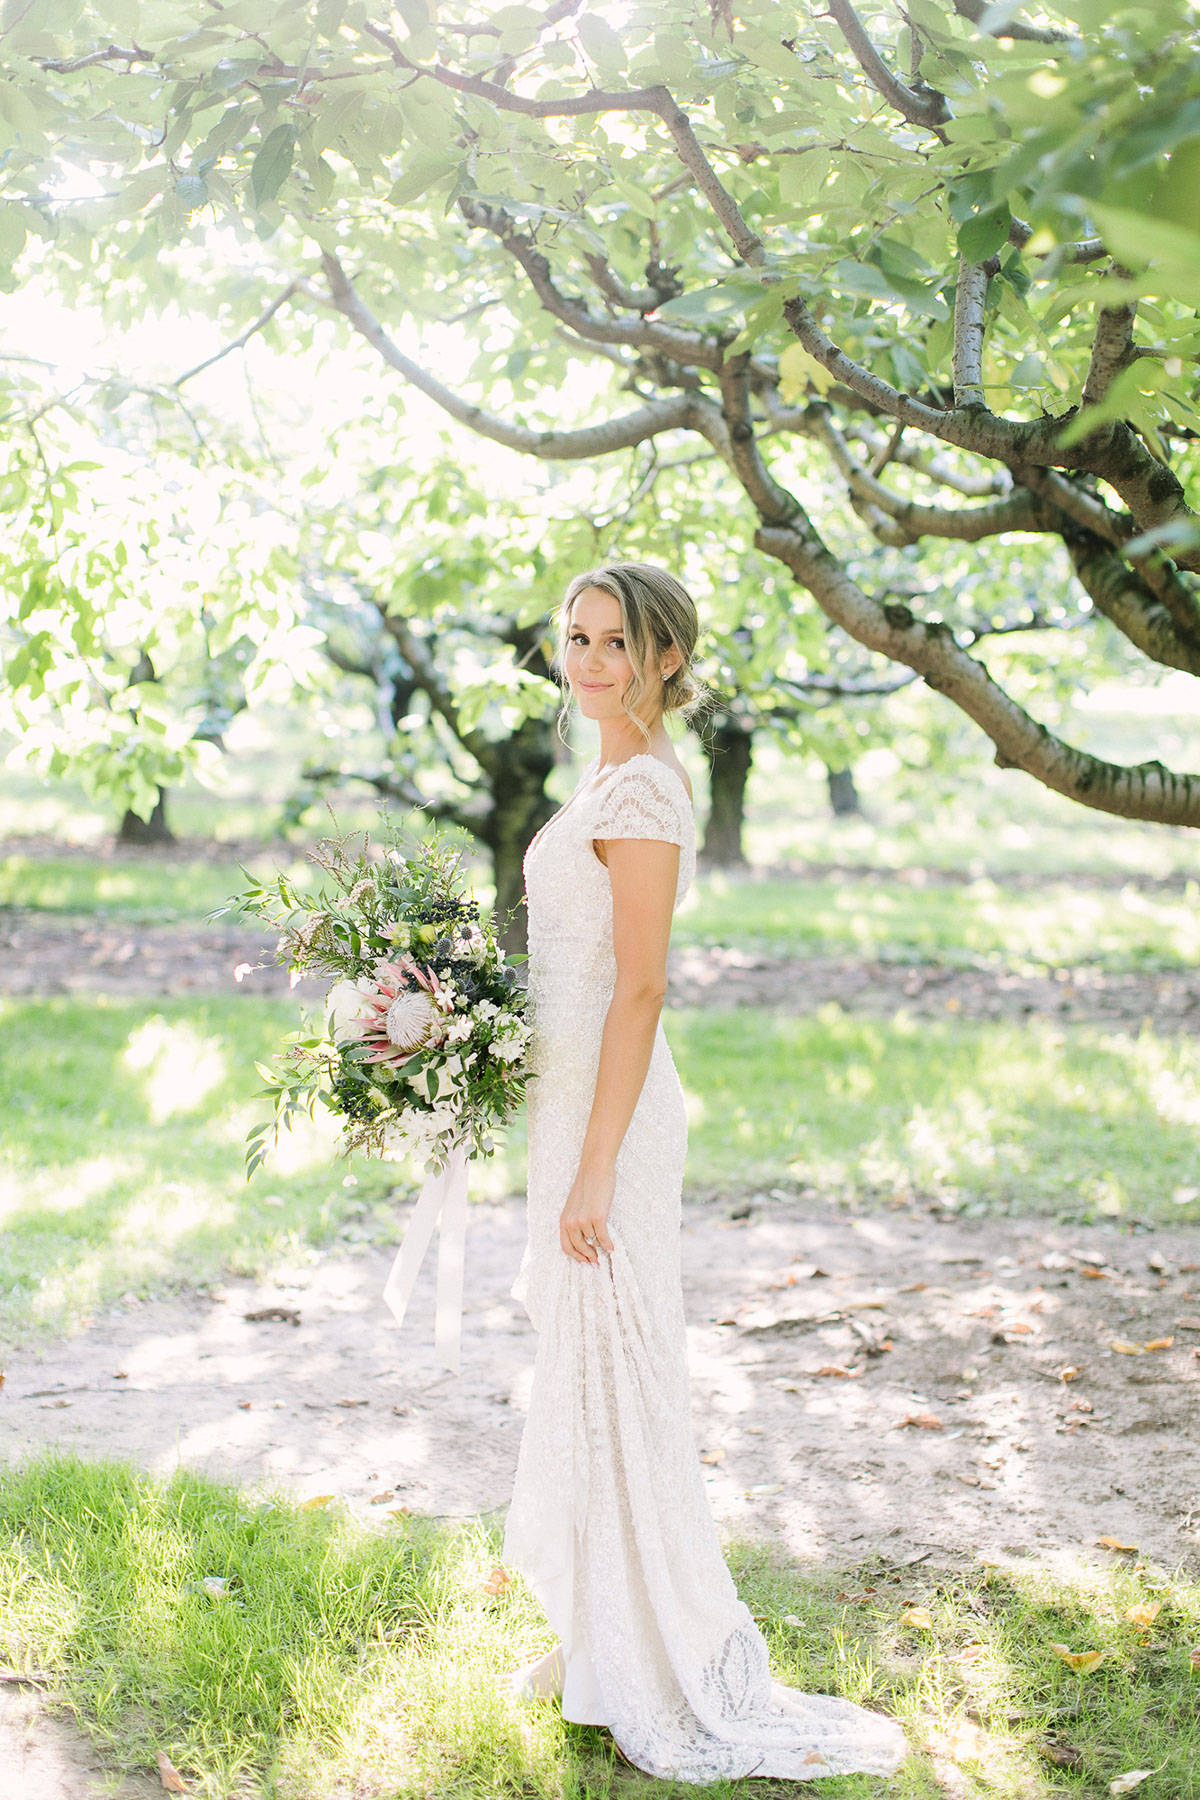 elizabeth-in-love-vineyard-bride-swish-list-cherry-avenue-farms-vineland-wedding-41.jpg